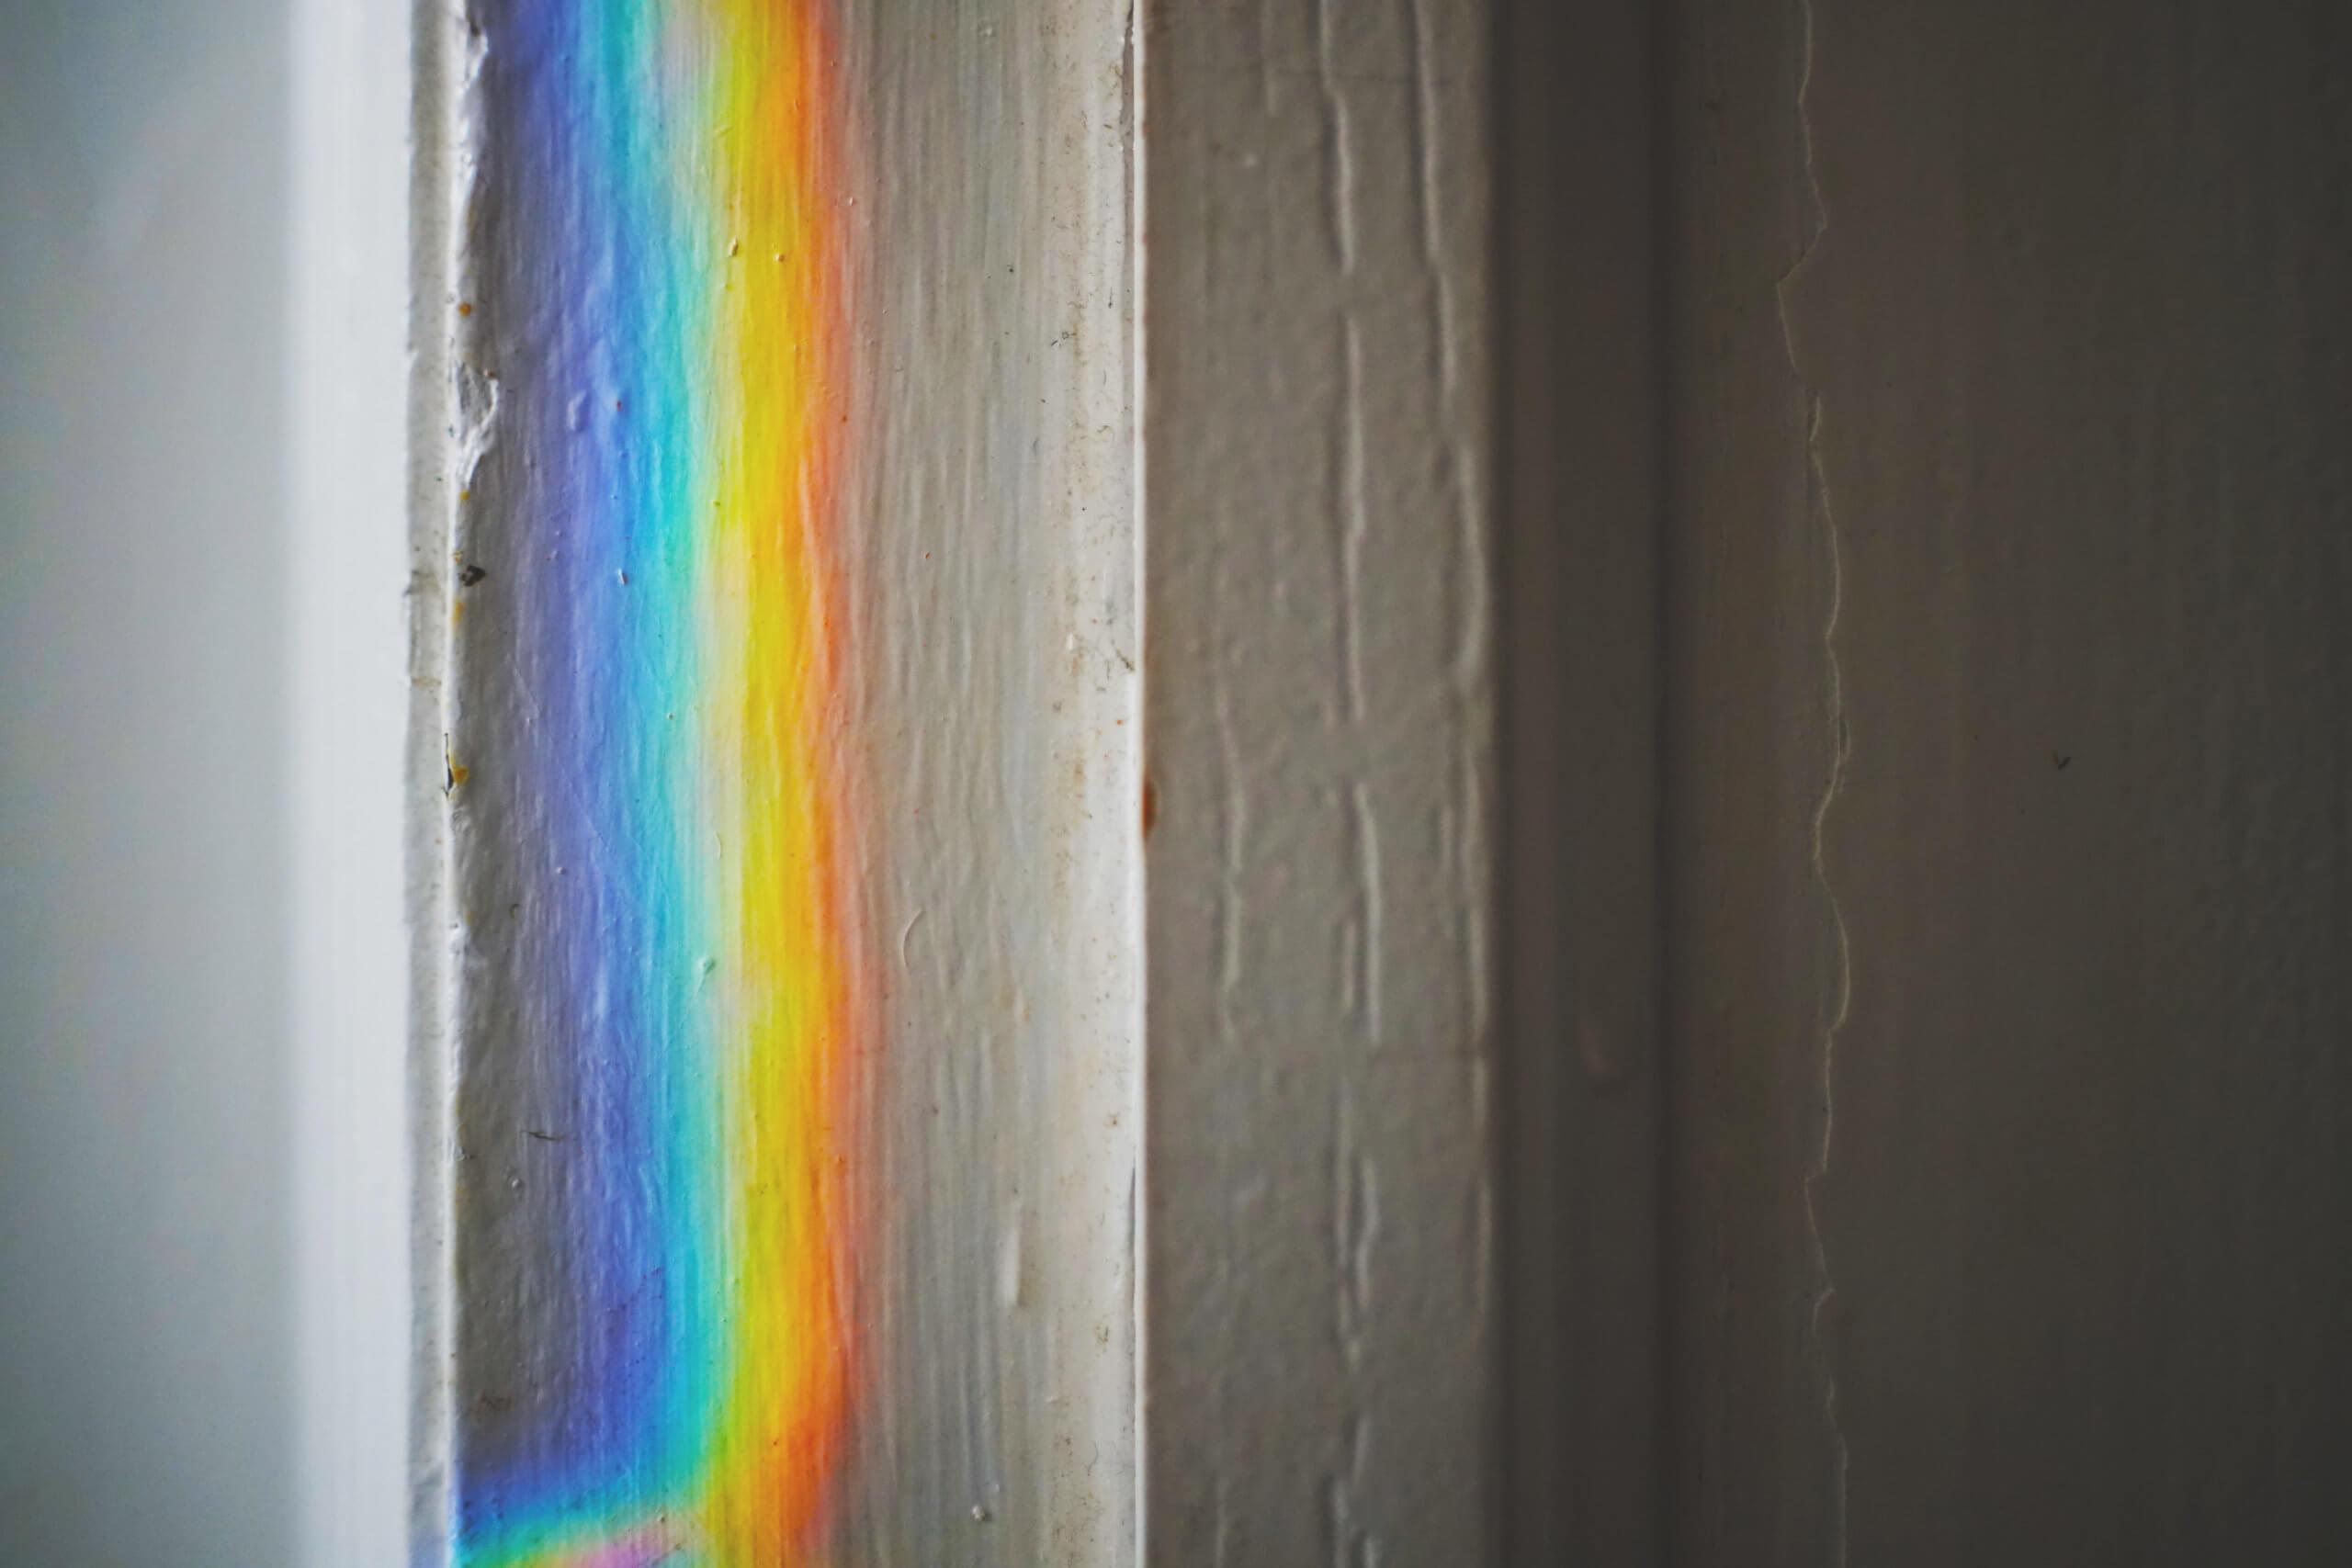 GAY - LESBICA - LGBT - PSICOLOGO ONLINE